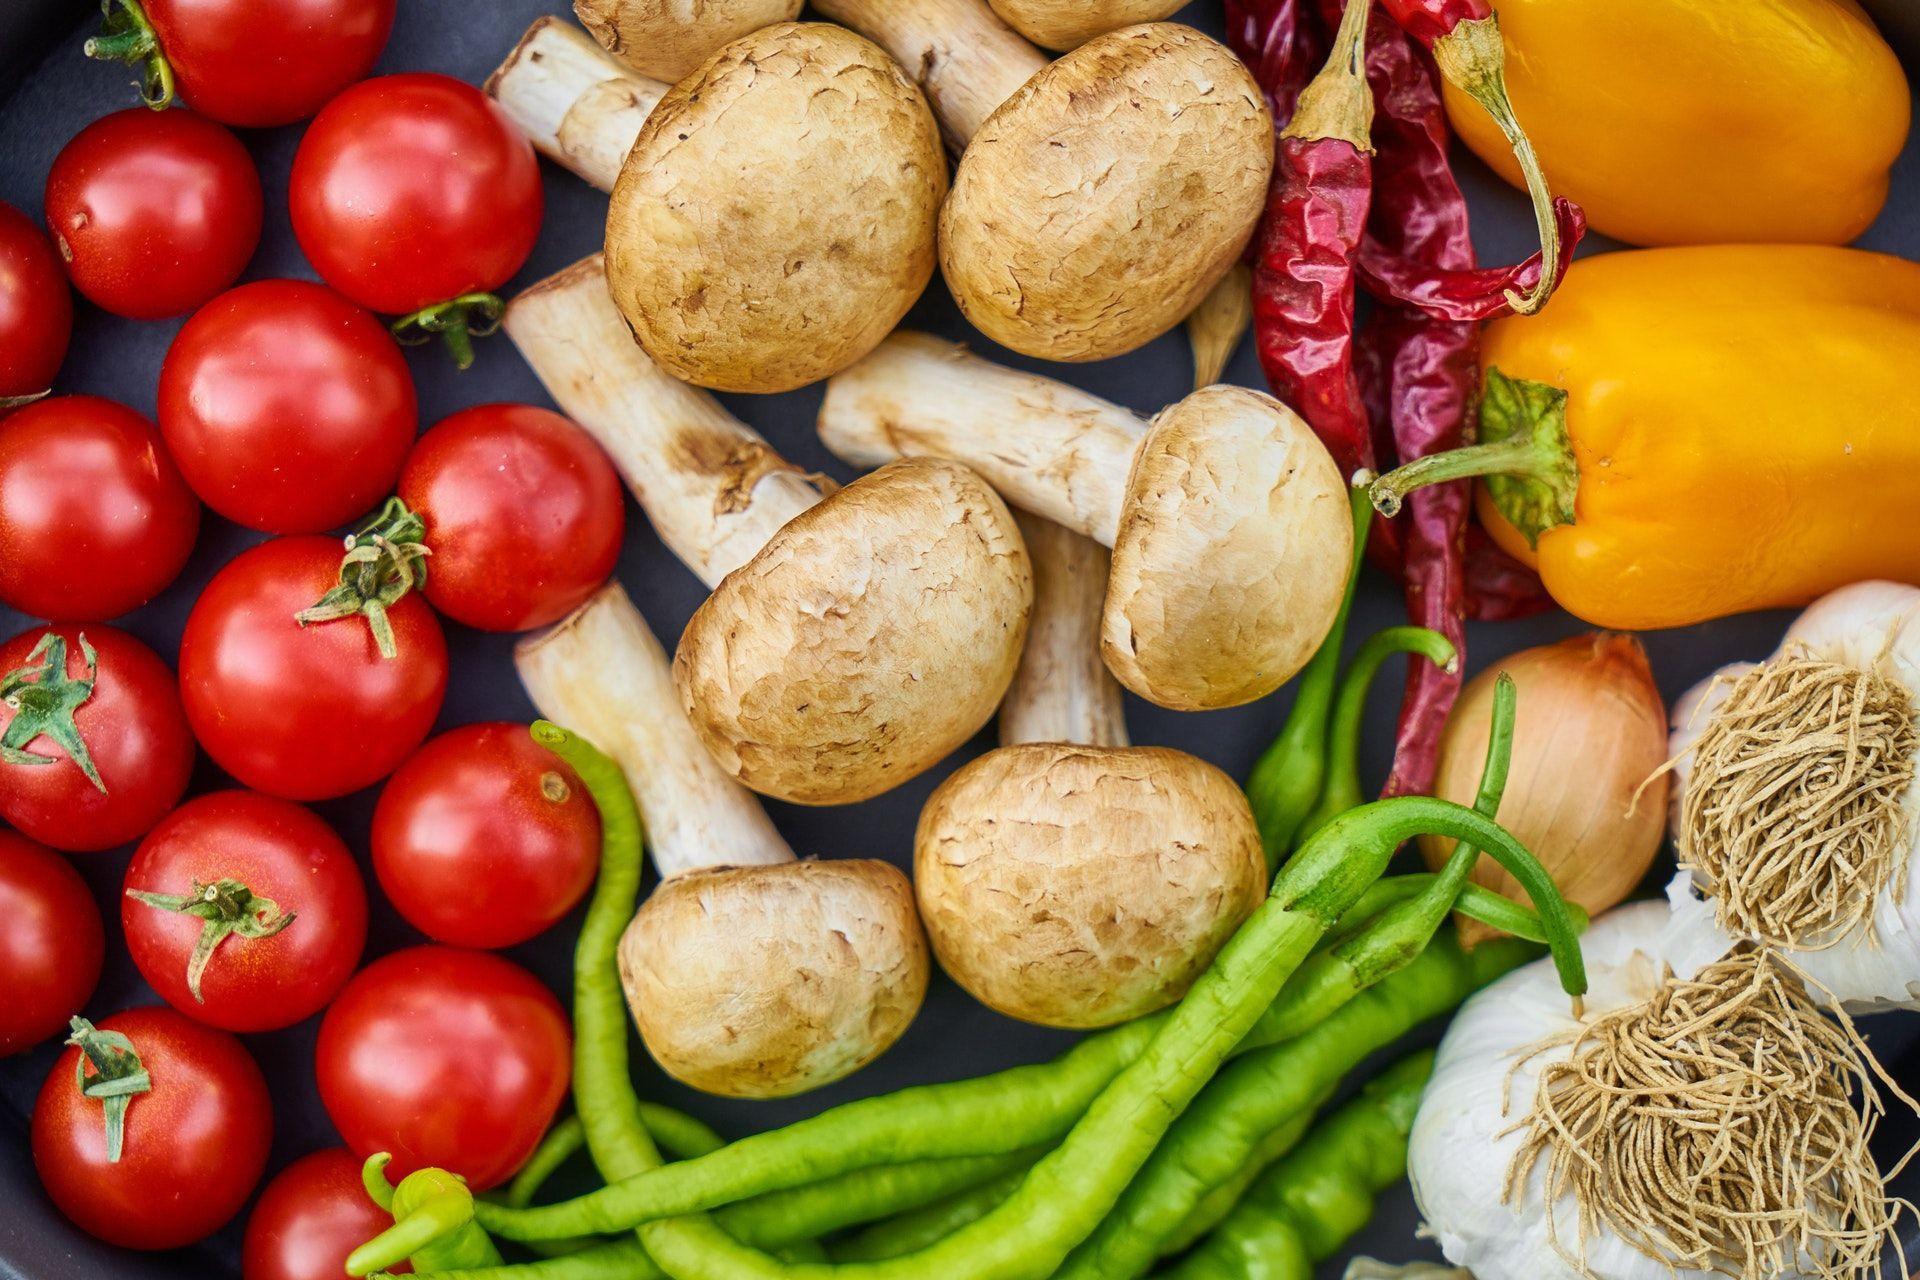 3 Ways To Make Any Food Tastier